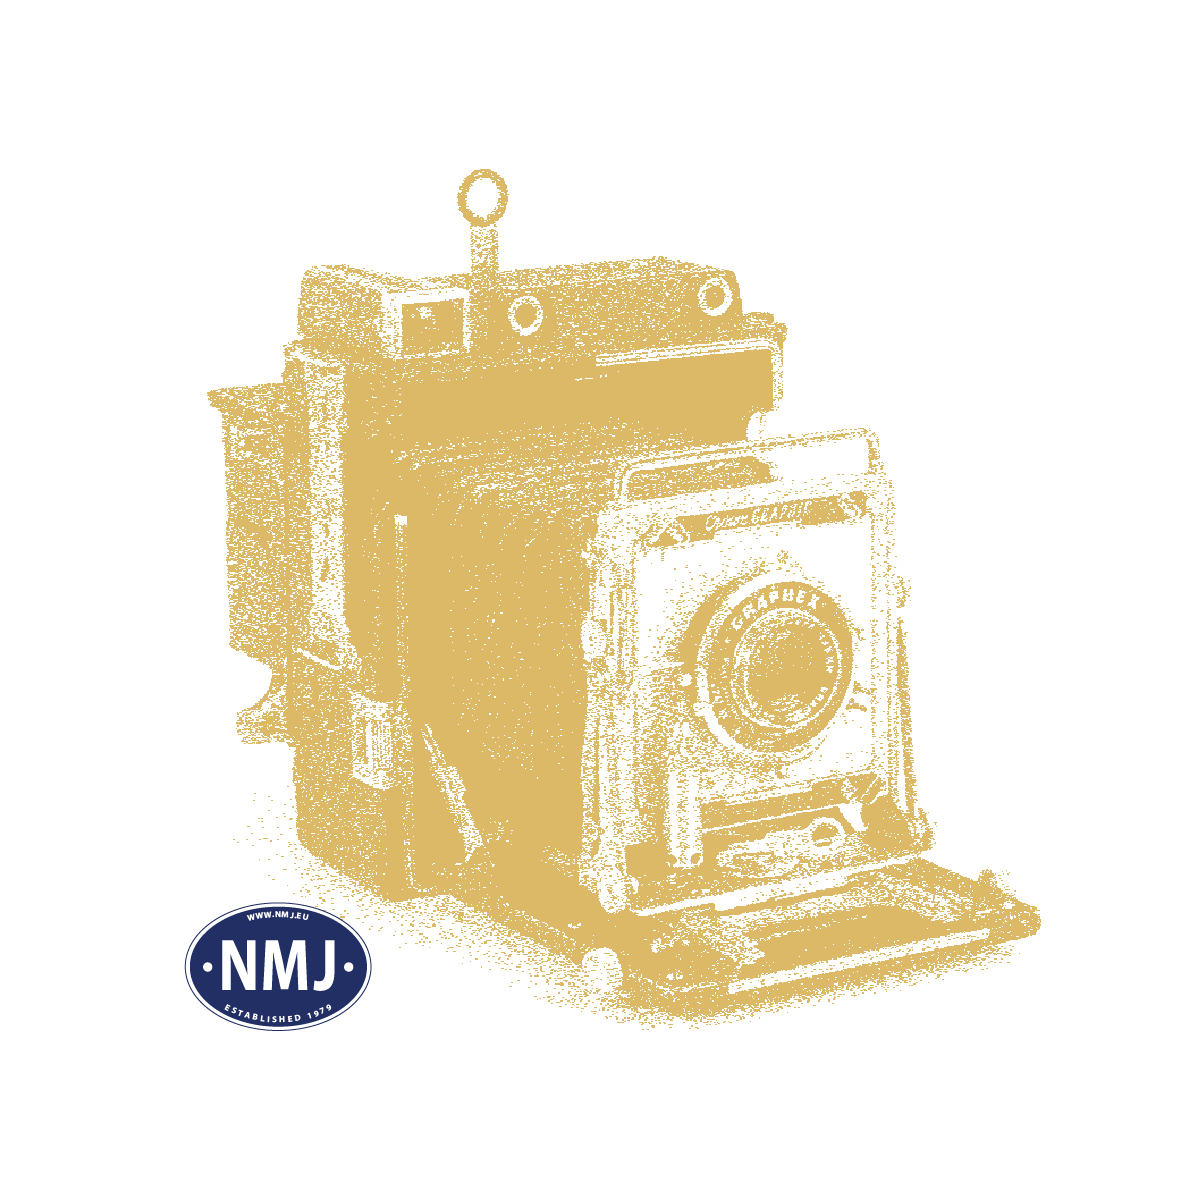 NOC15824 - Skyøteløpere